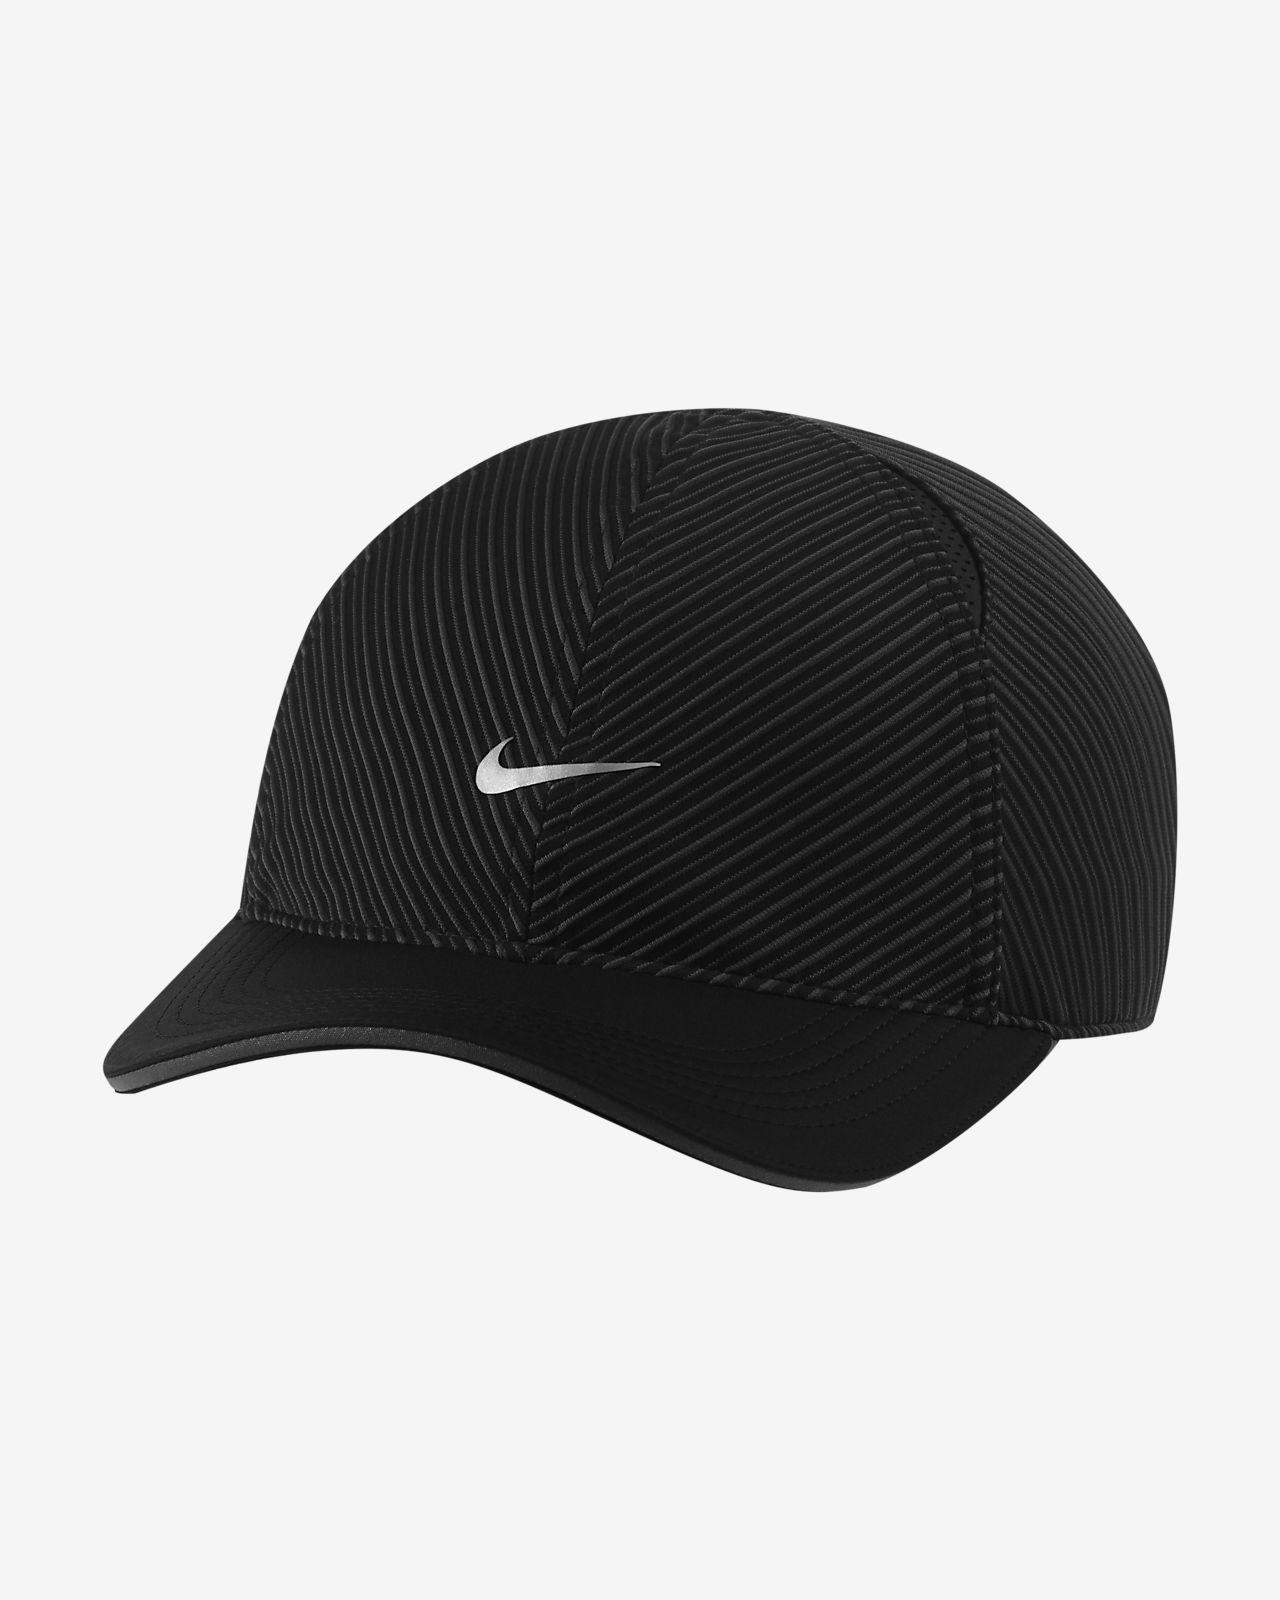 Nike Dri-FIT AeroBill Featherlight Strick-Laufmütze